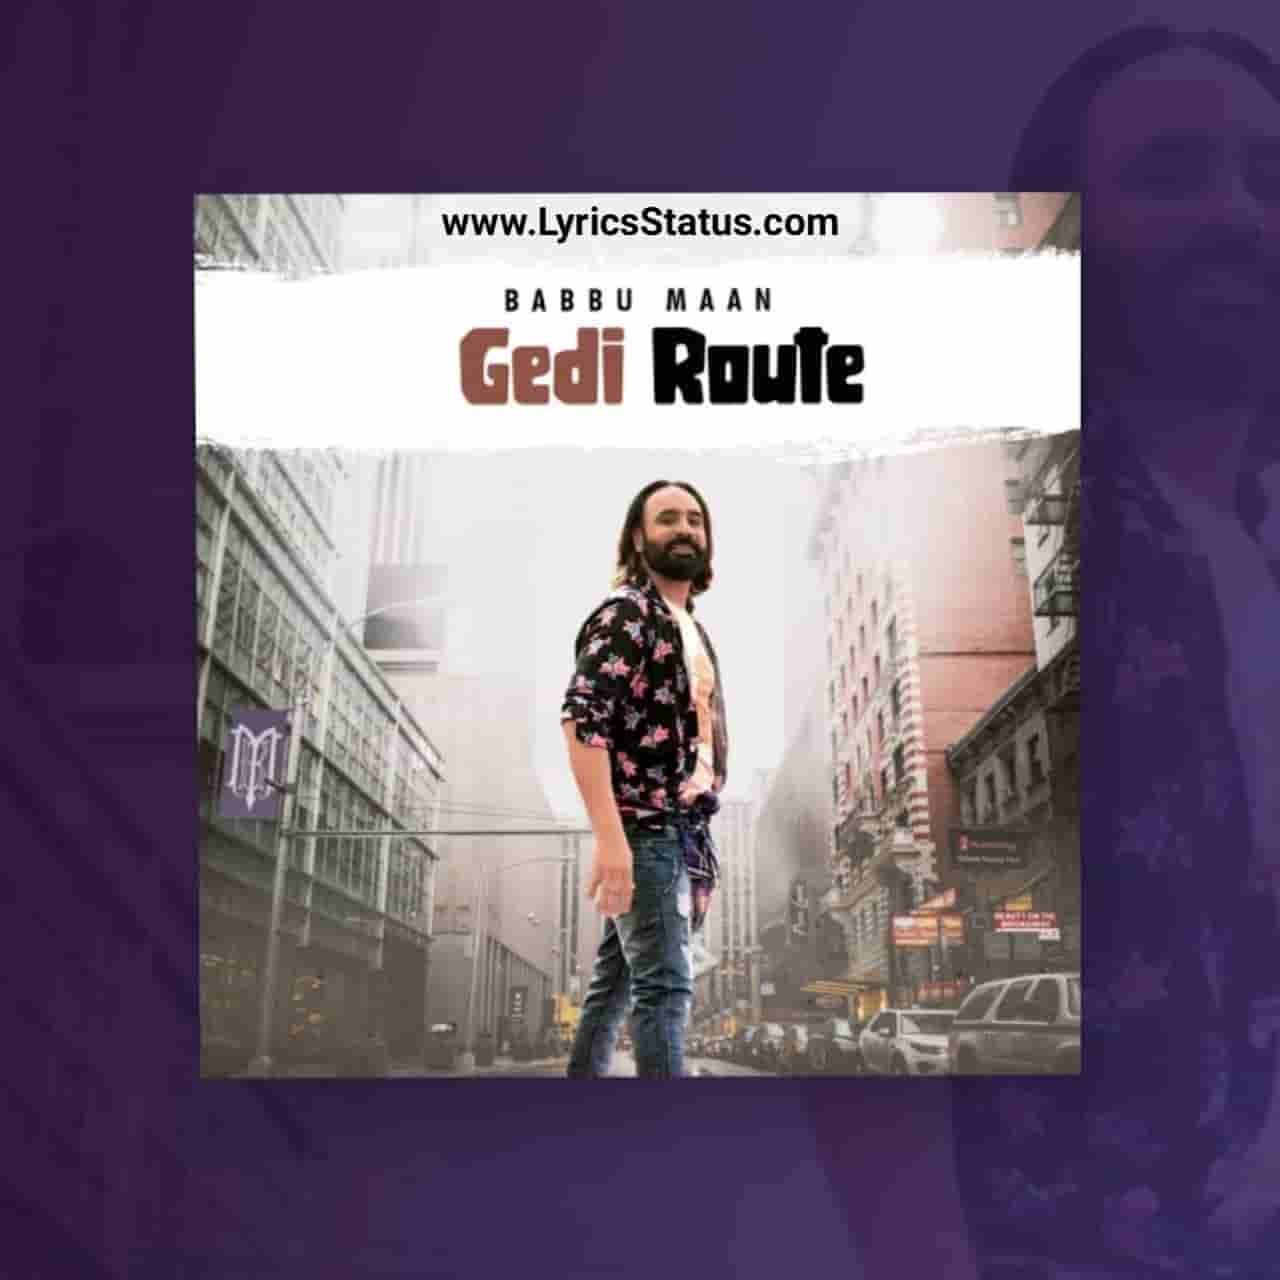 Babbu Maan Gedi Route te Aaja Lyrics Status Download Video Latest punjabi song Ni Mitran nu Je Milna Gedi Routete Aaja punjabi songBabbu Maan